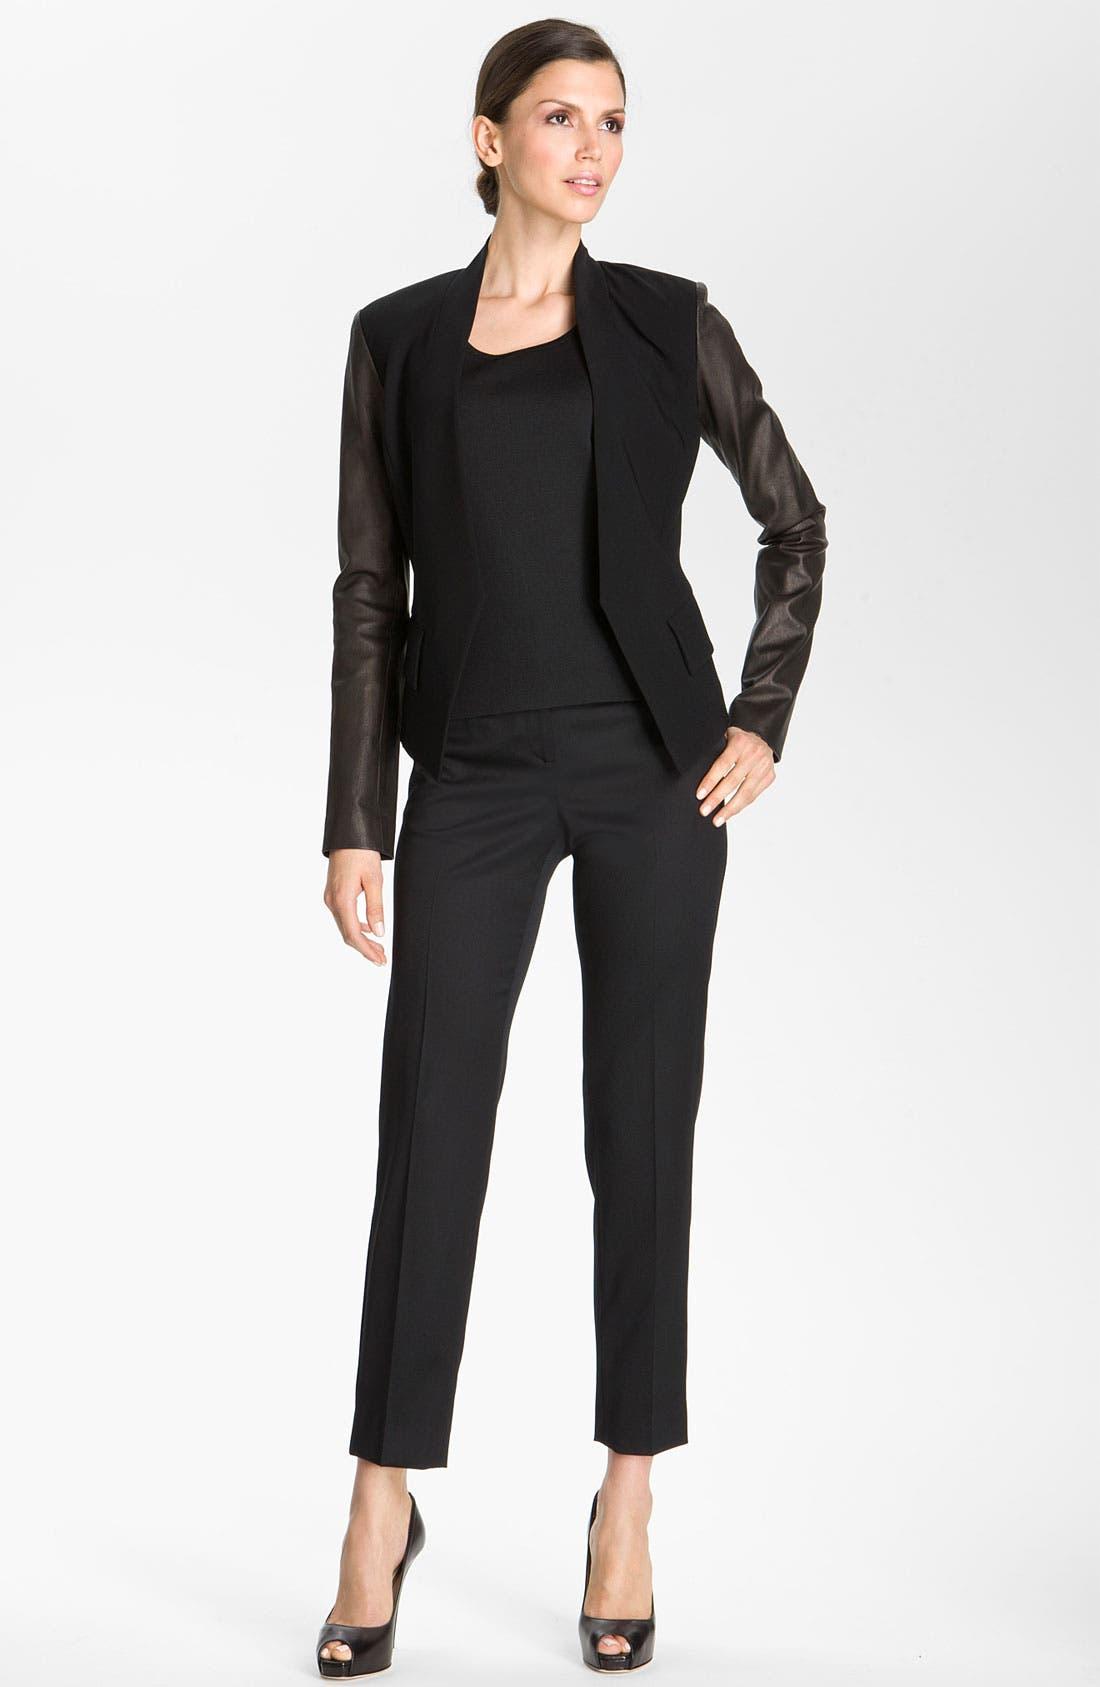 Alternate Image 1 Selected - St. John Collection Crepe Marocain & Leather Jacket